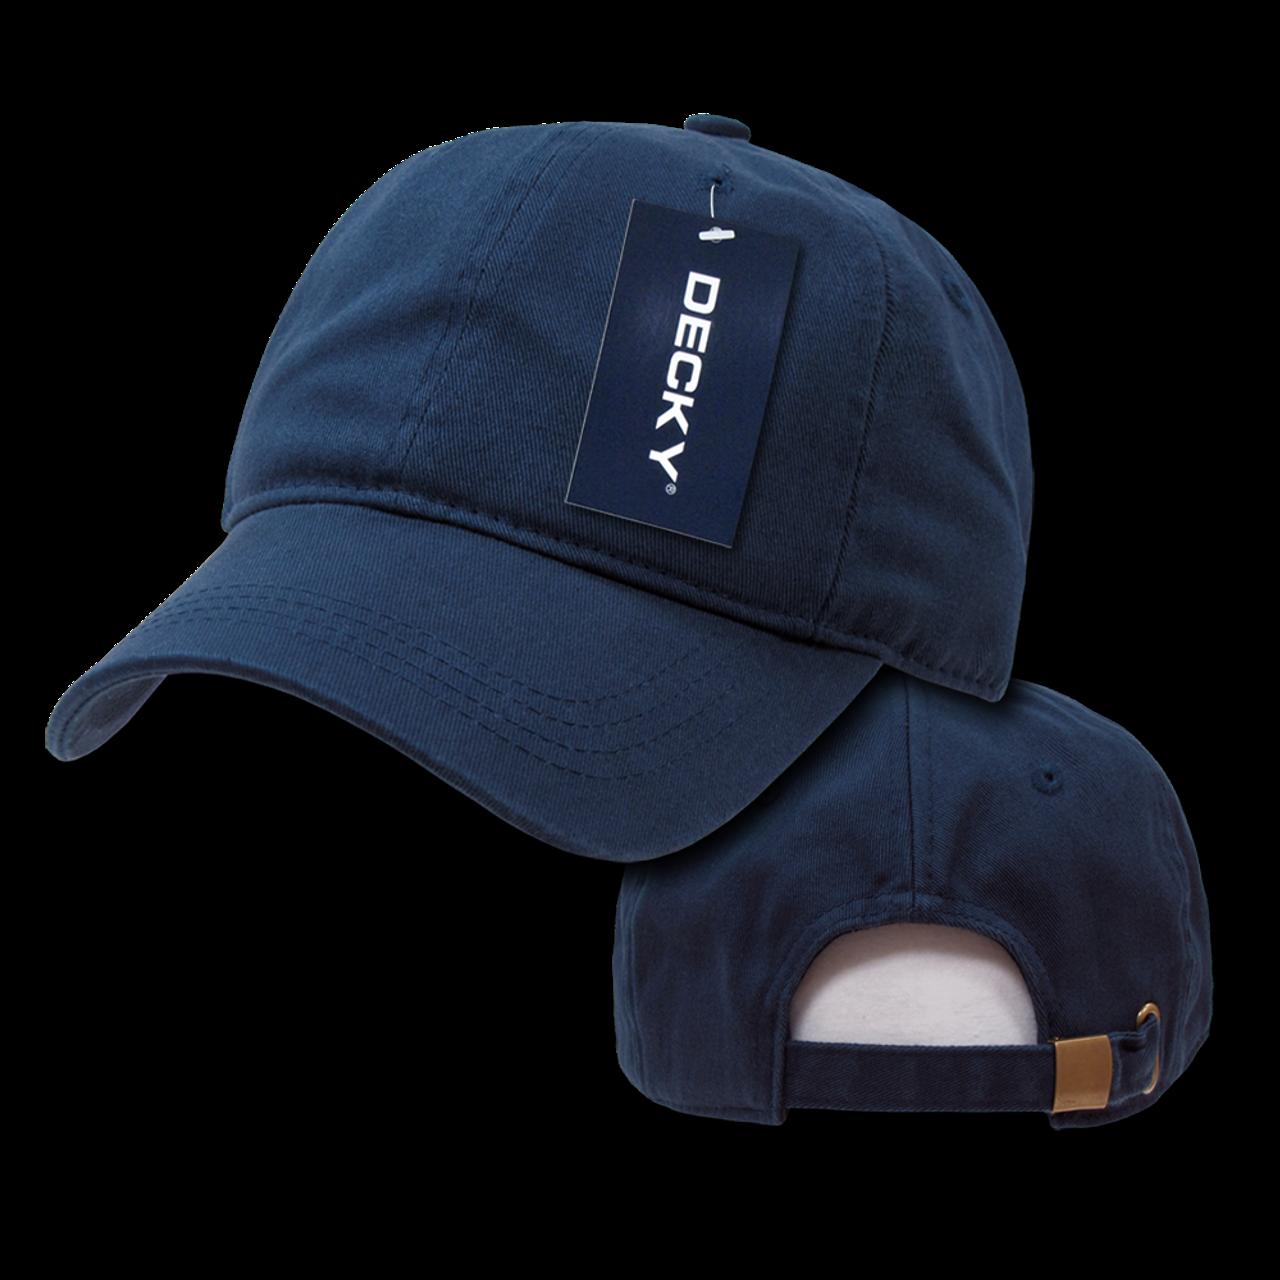 Two-Ply Polo Cap - Navy Blue - USMILITARYHATS.COM fea576b6ec4